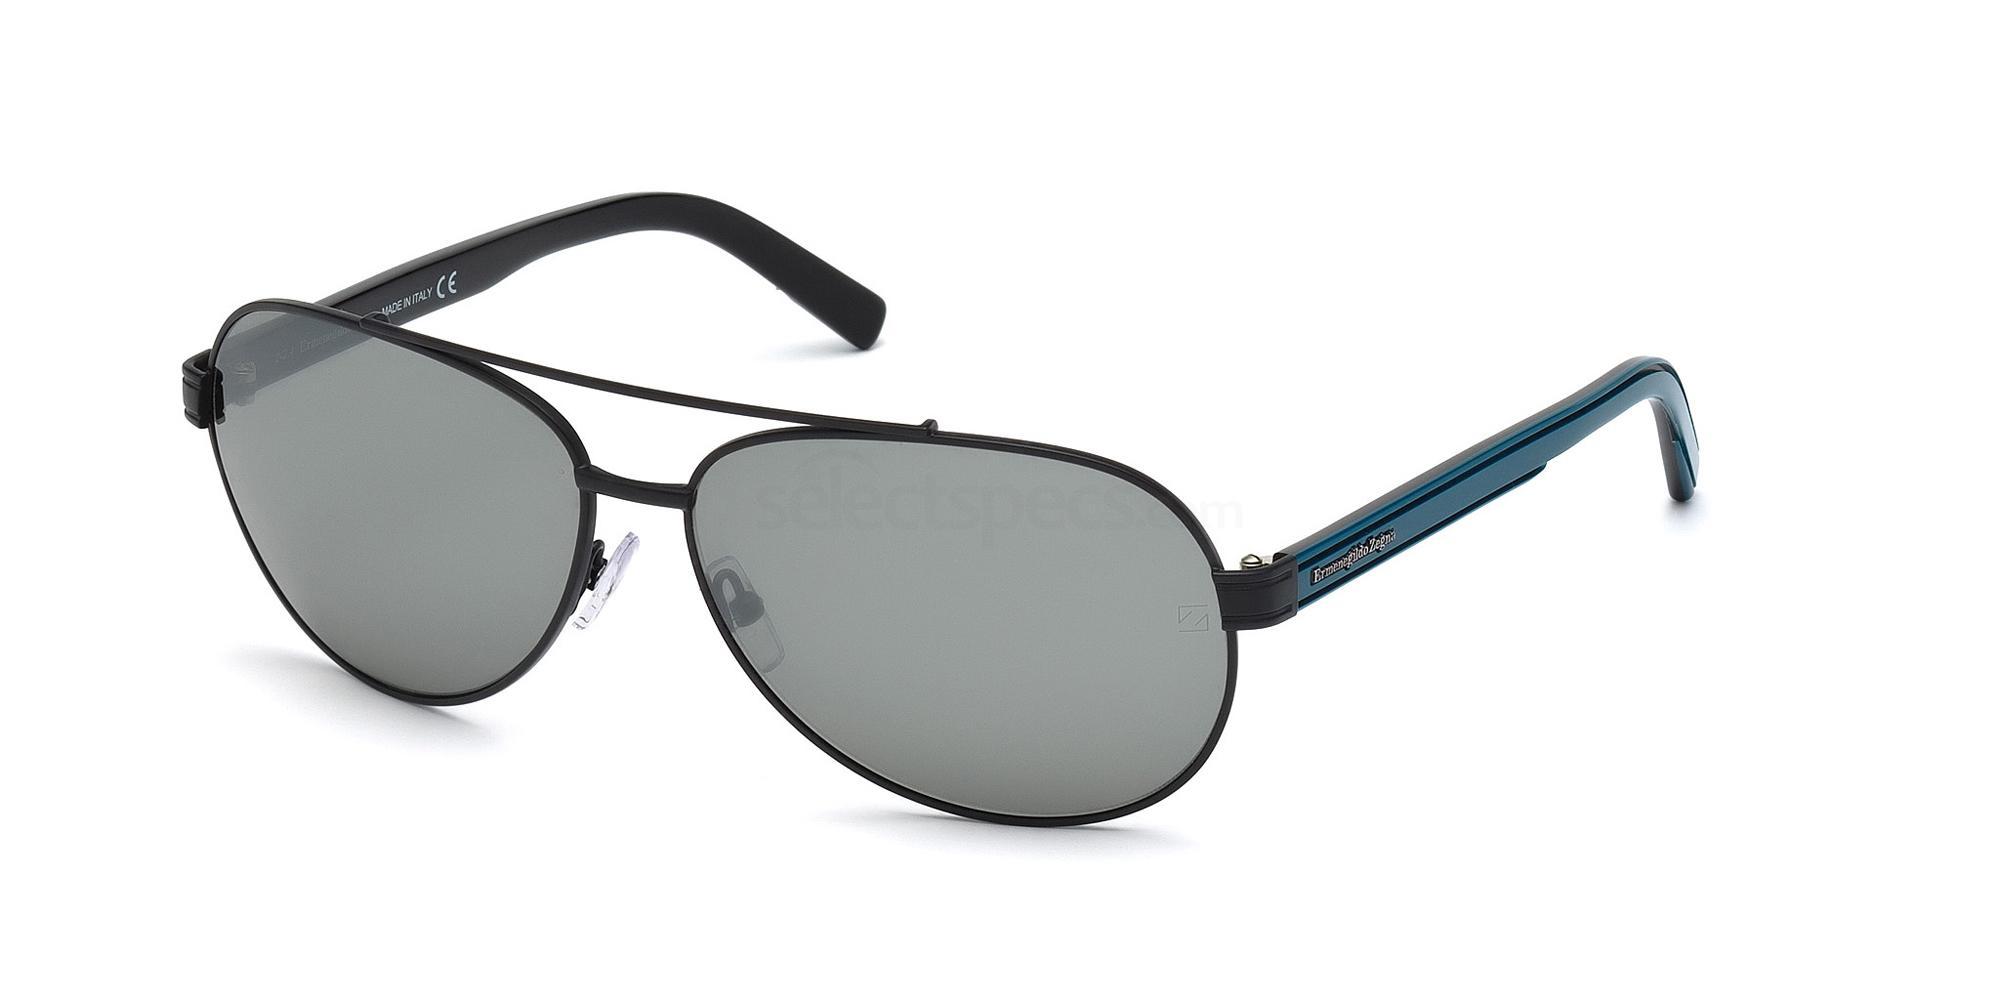 02A EZ0004 Sunglasses, Ermenegildo Zegna